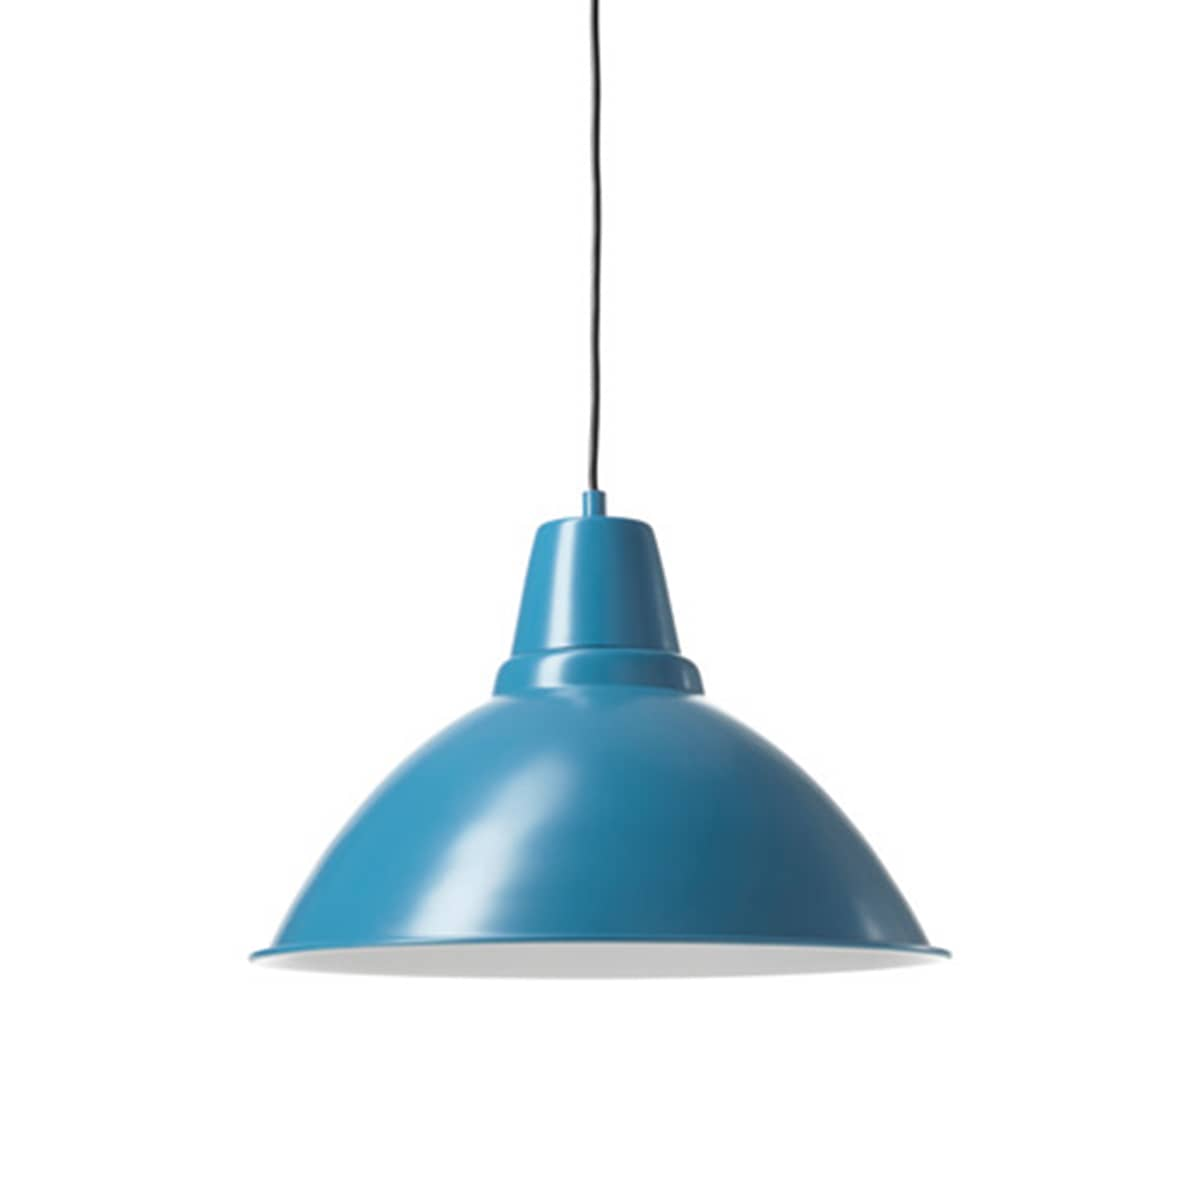 10 Budget-Friendly Kitchen Pendant Lights: gallery image 7